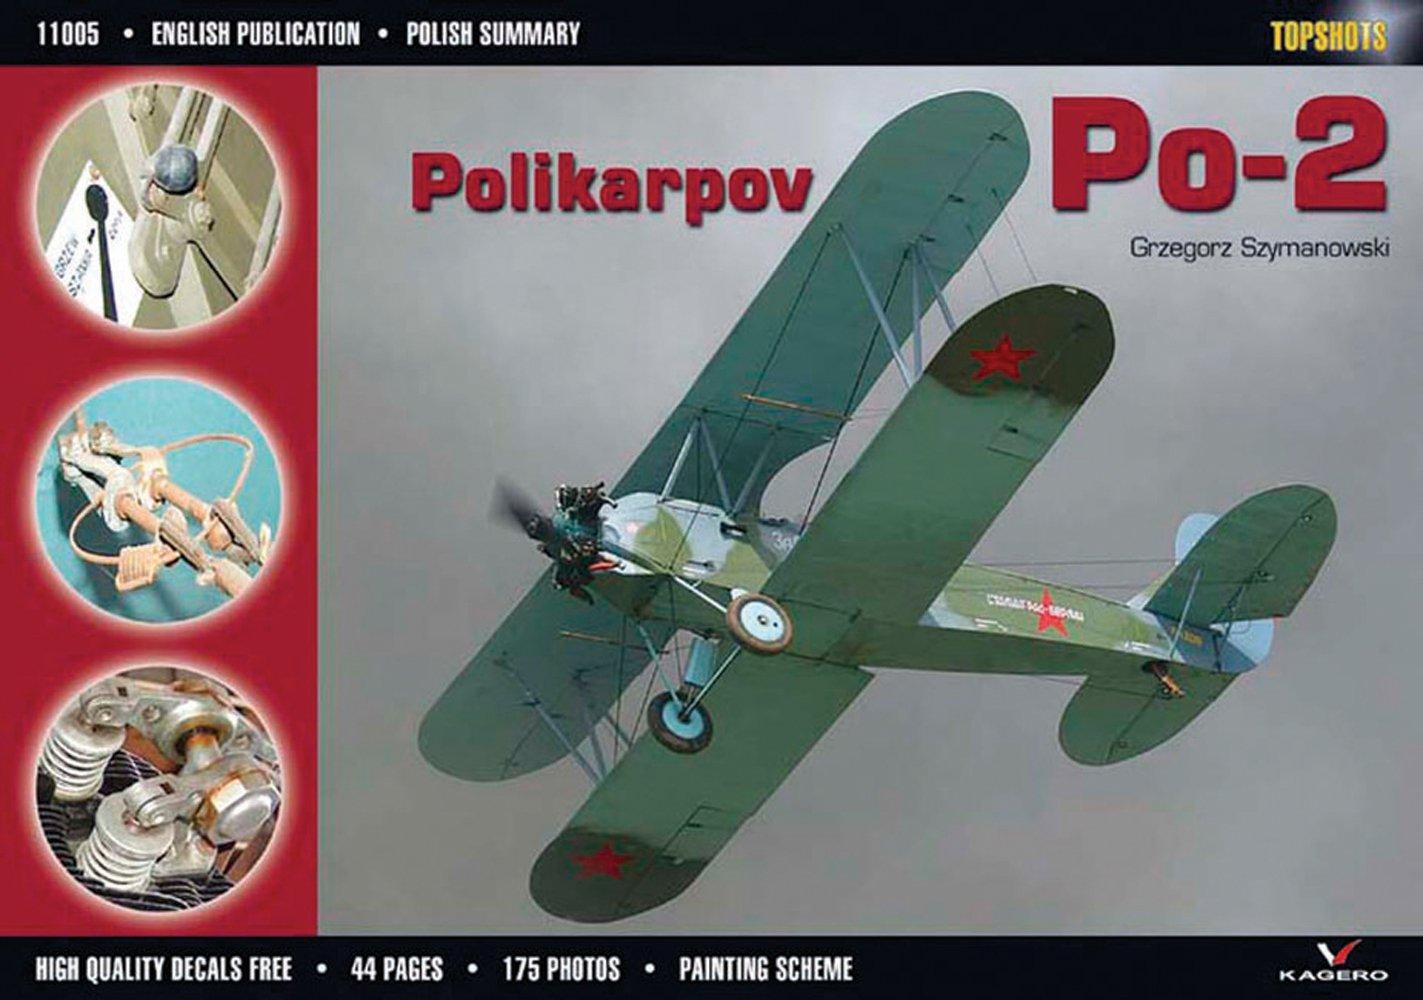 Download Polikarpow Po-2 (TopShots) ebook